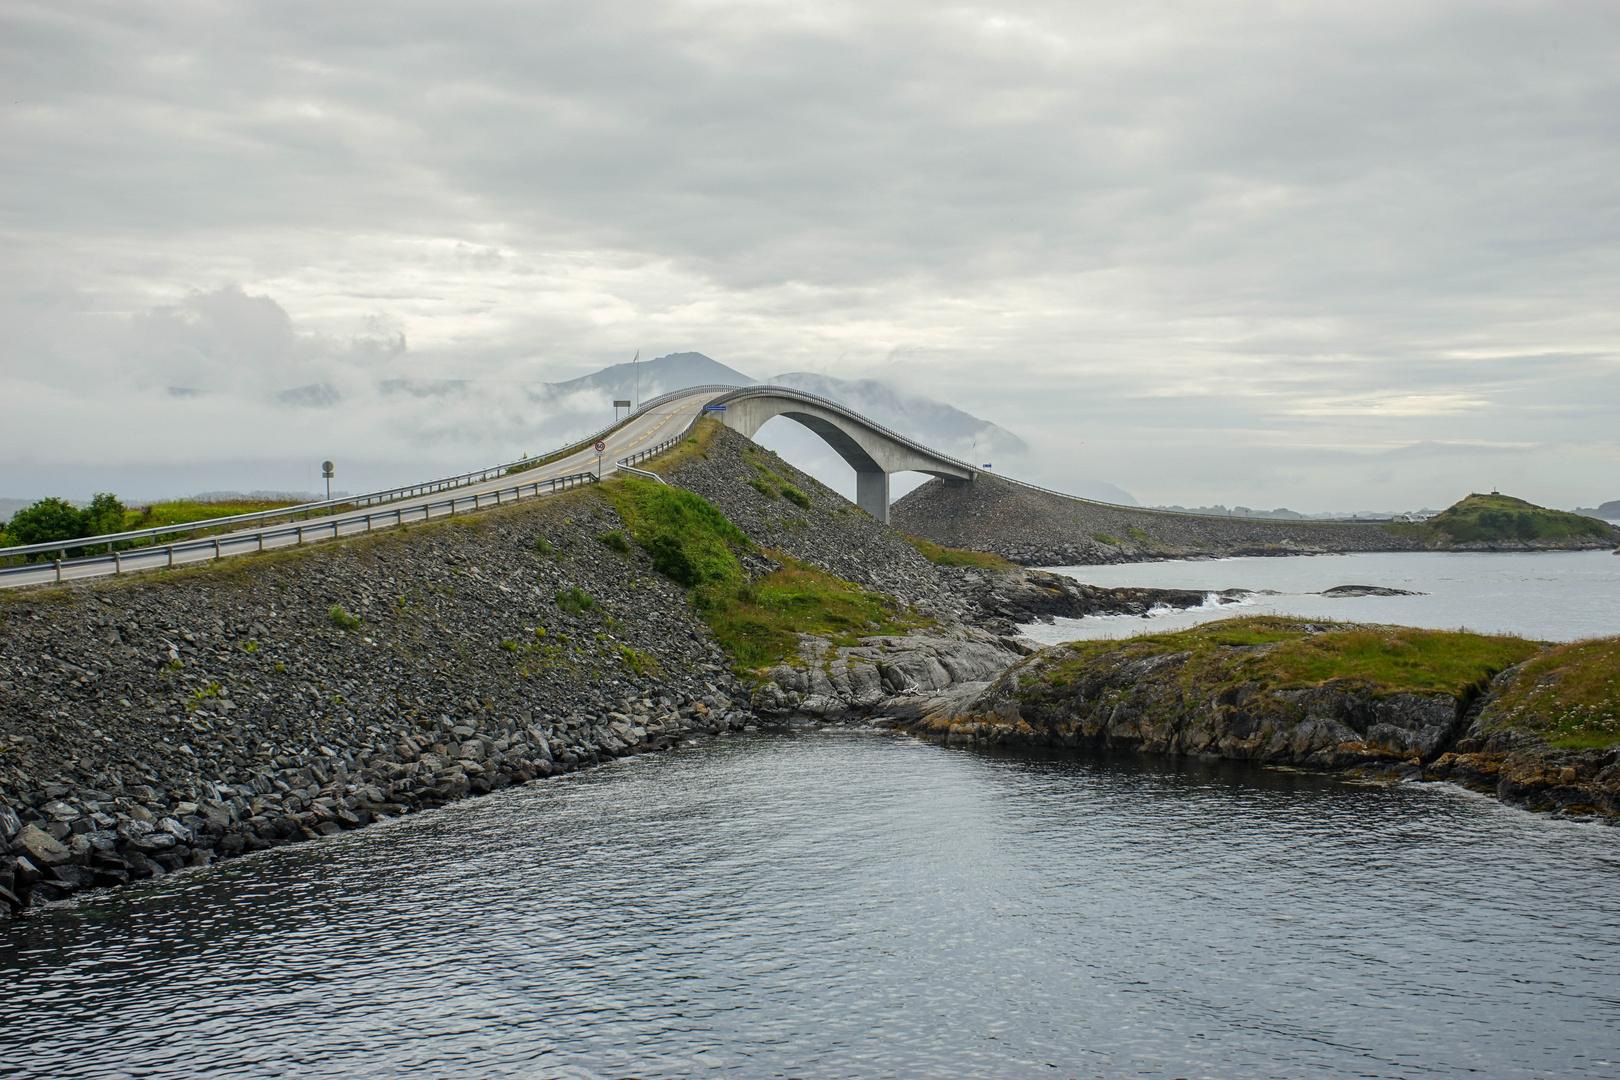 Atlantik Brücke